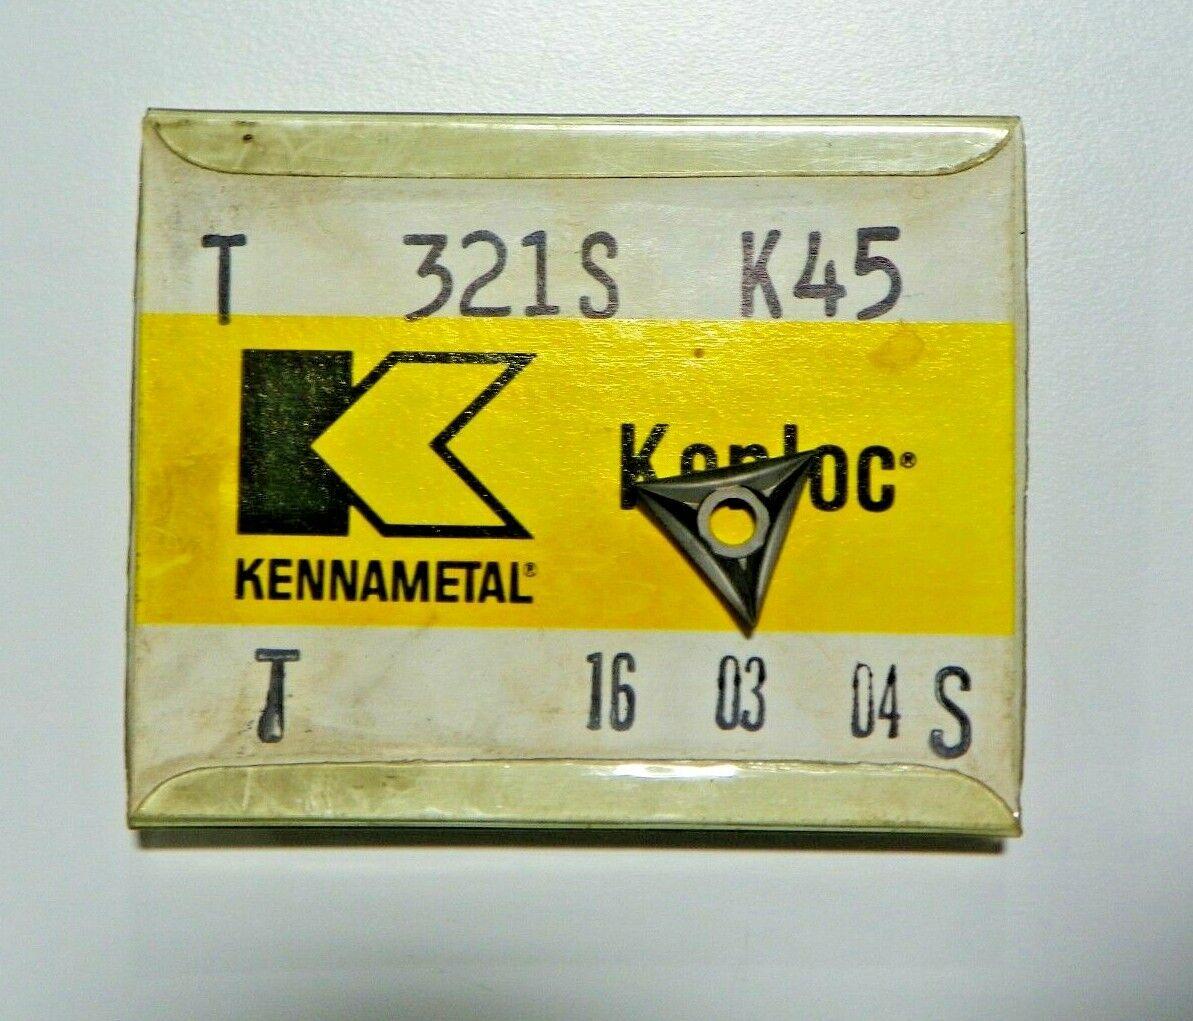 5 Kennametal T 321S K45 Carbide Inserts